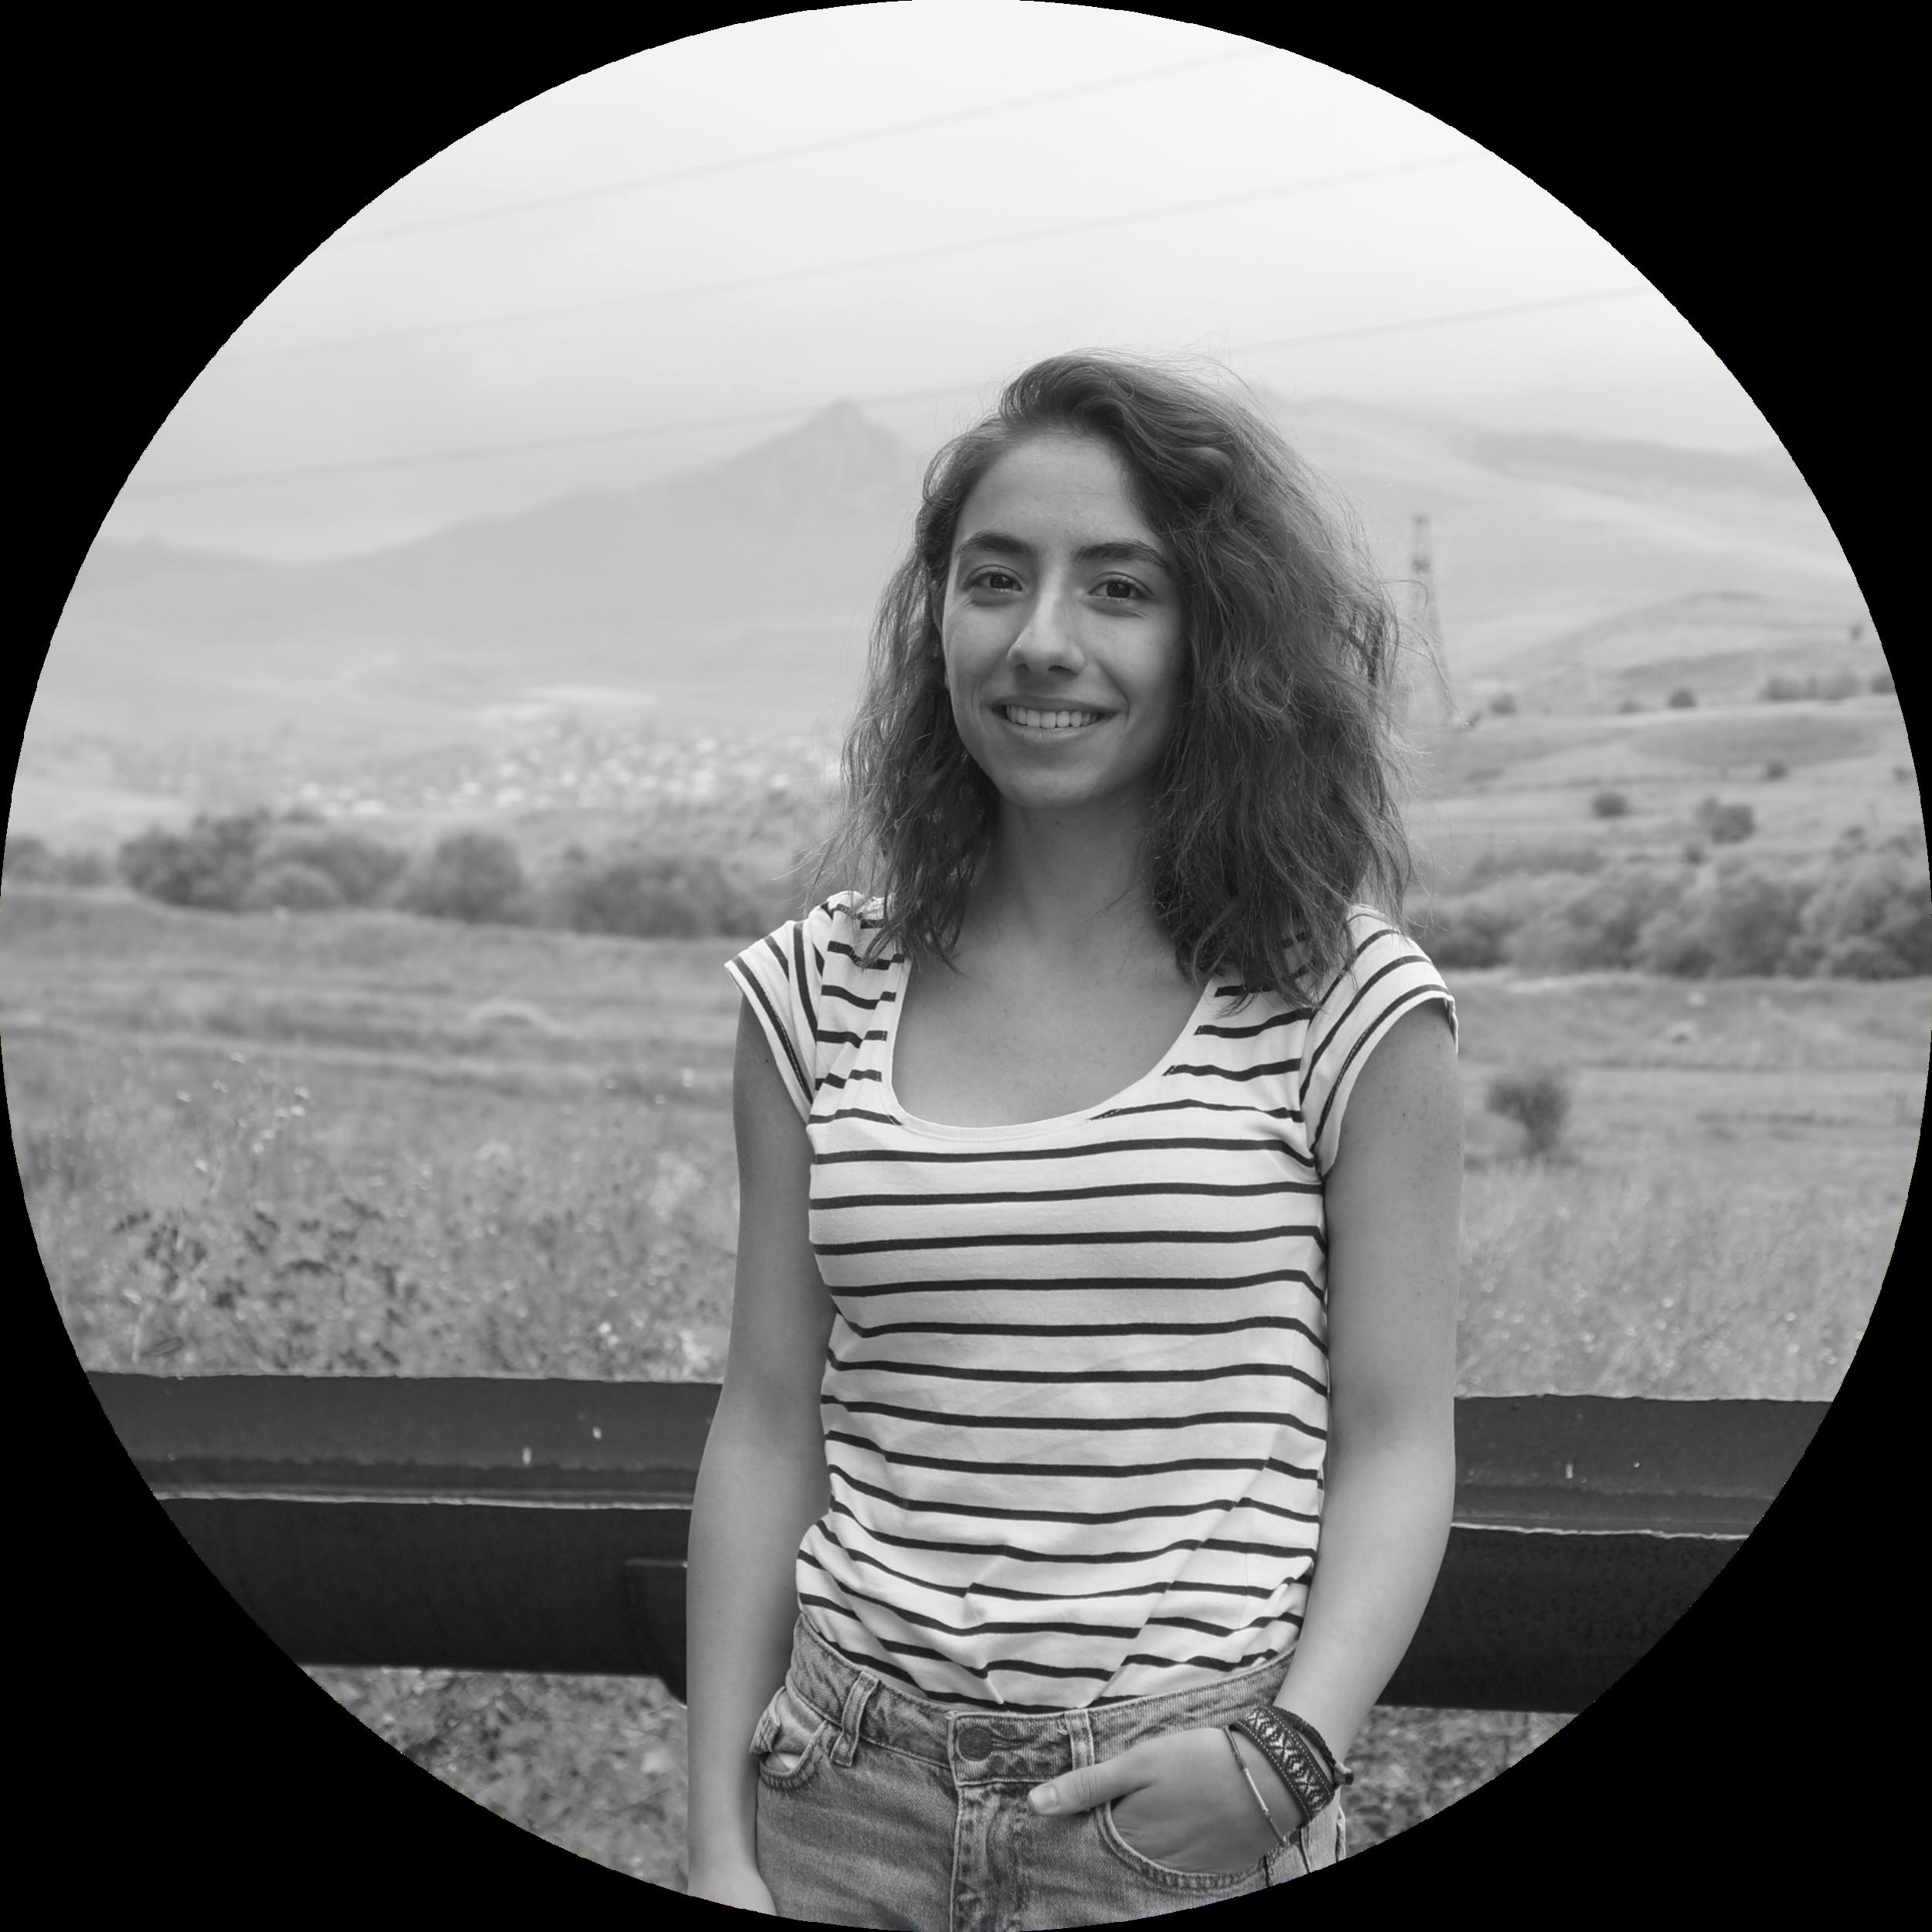 Arpine Hovhannisyan - Interview Lead, AUA Student